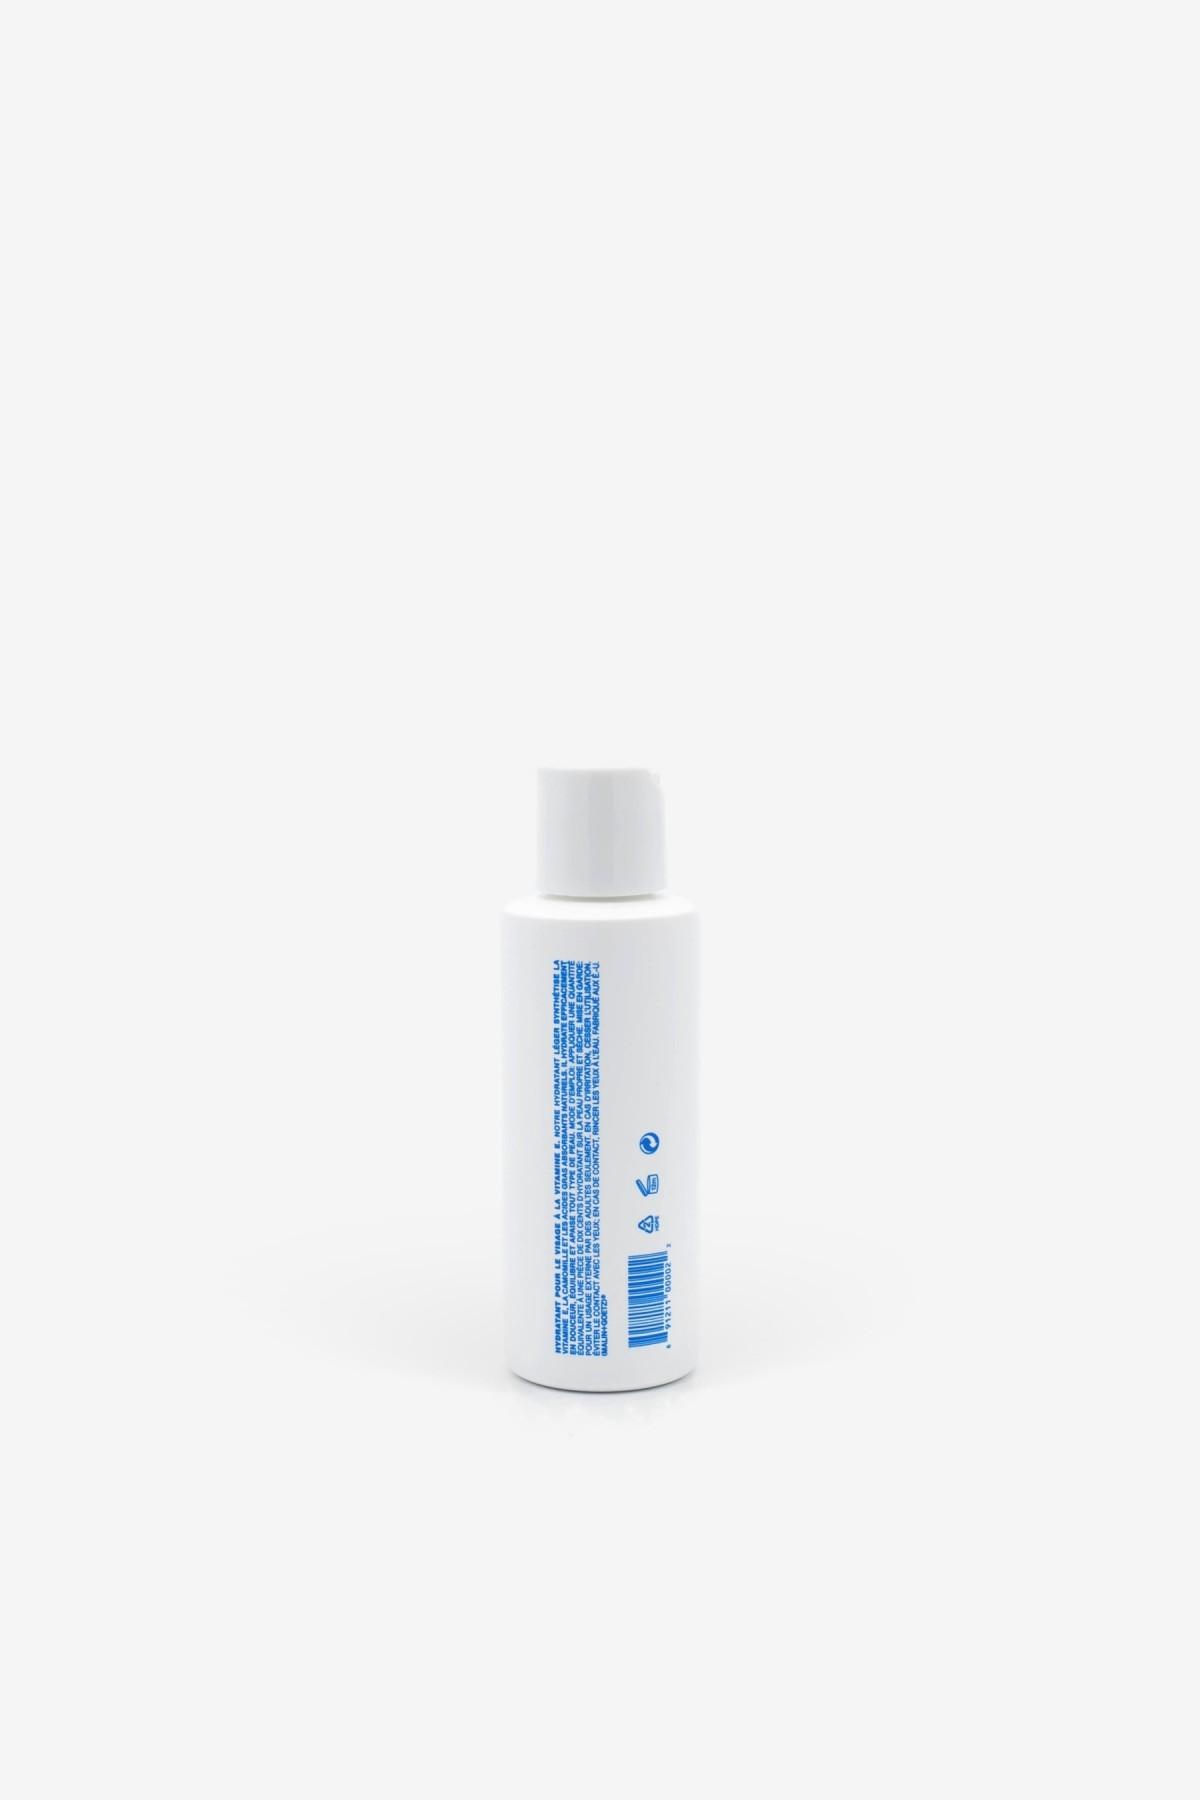 Malin+Goetz Vitamin E Face Moisturizer 118ml in